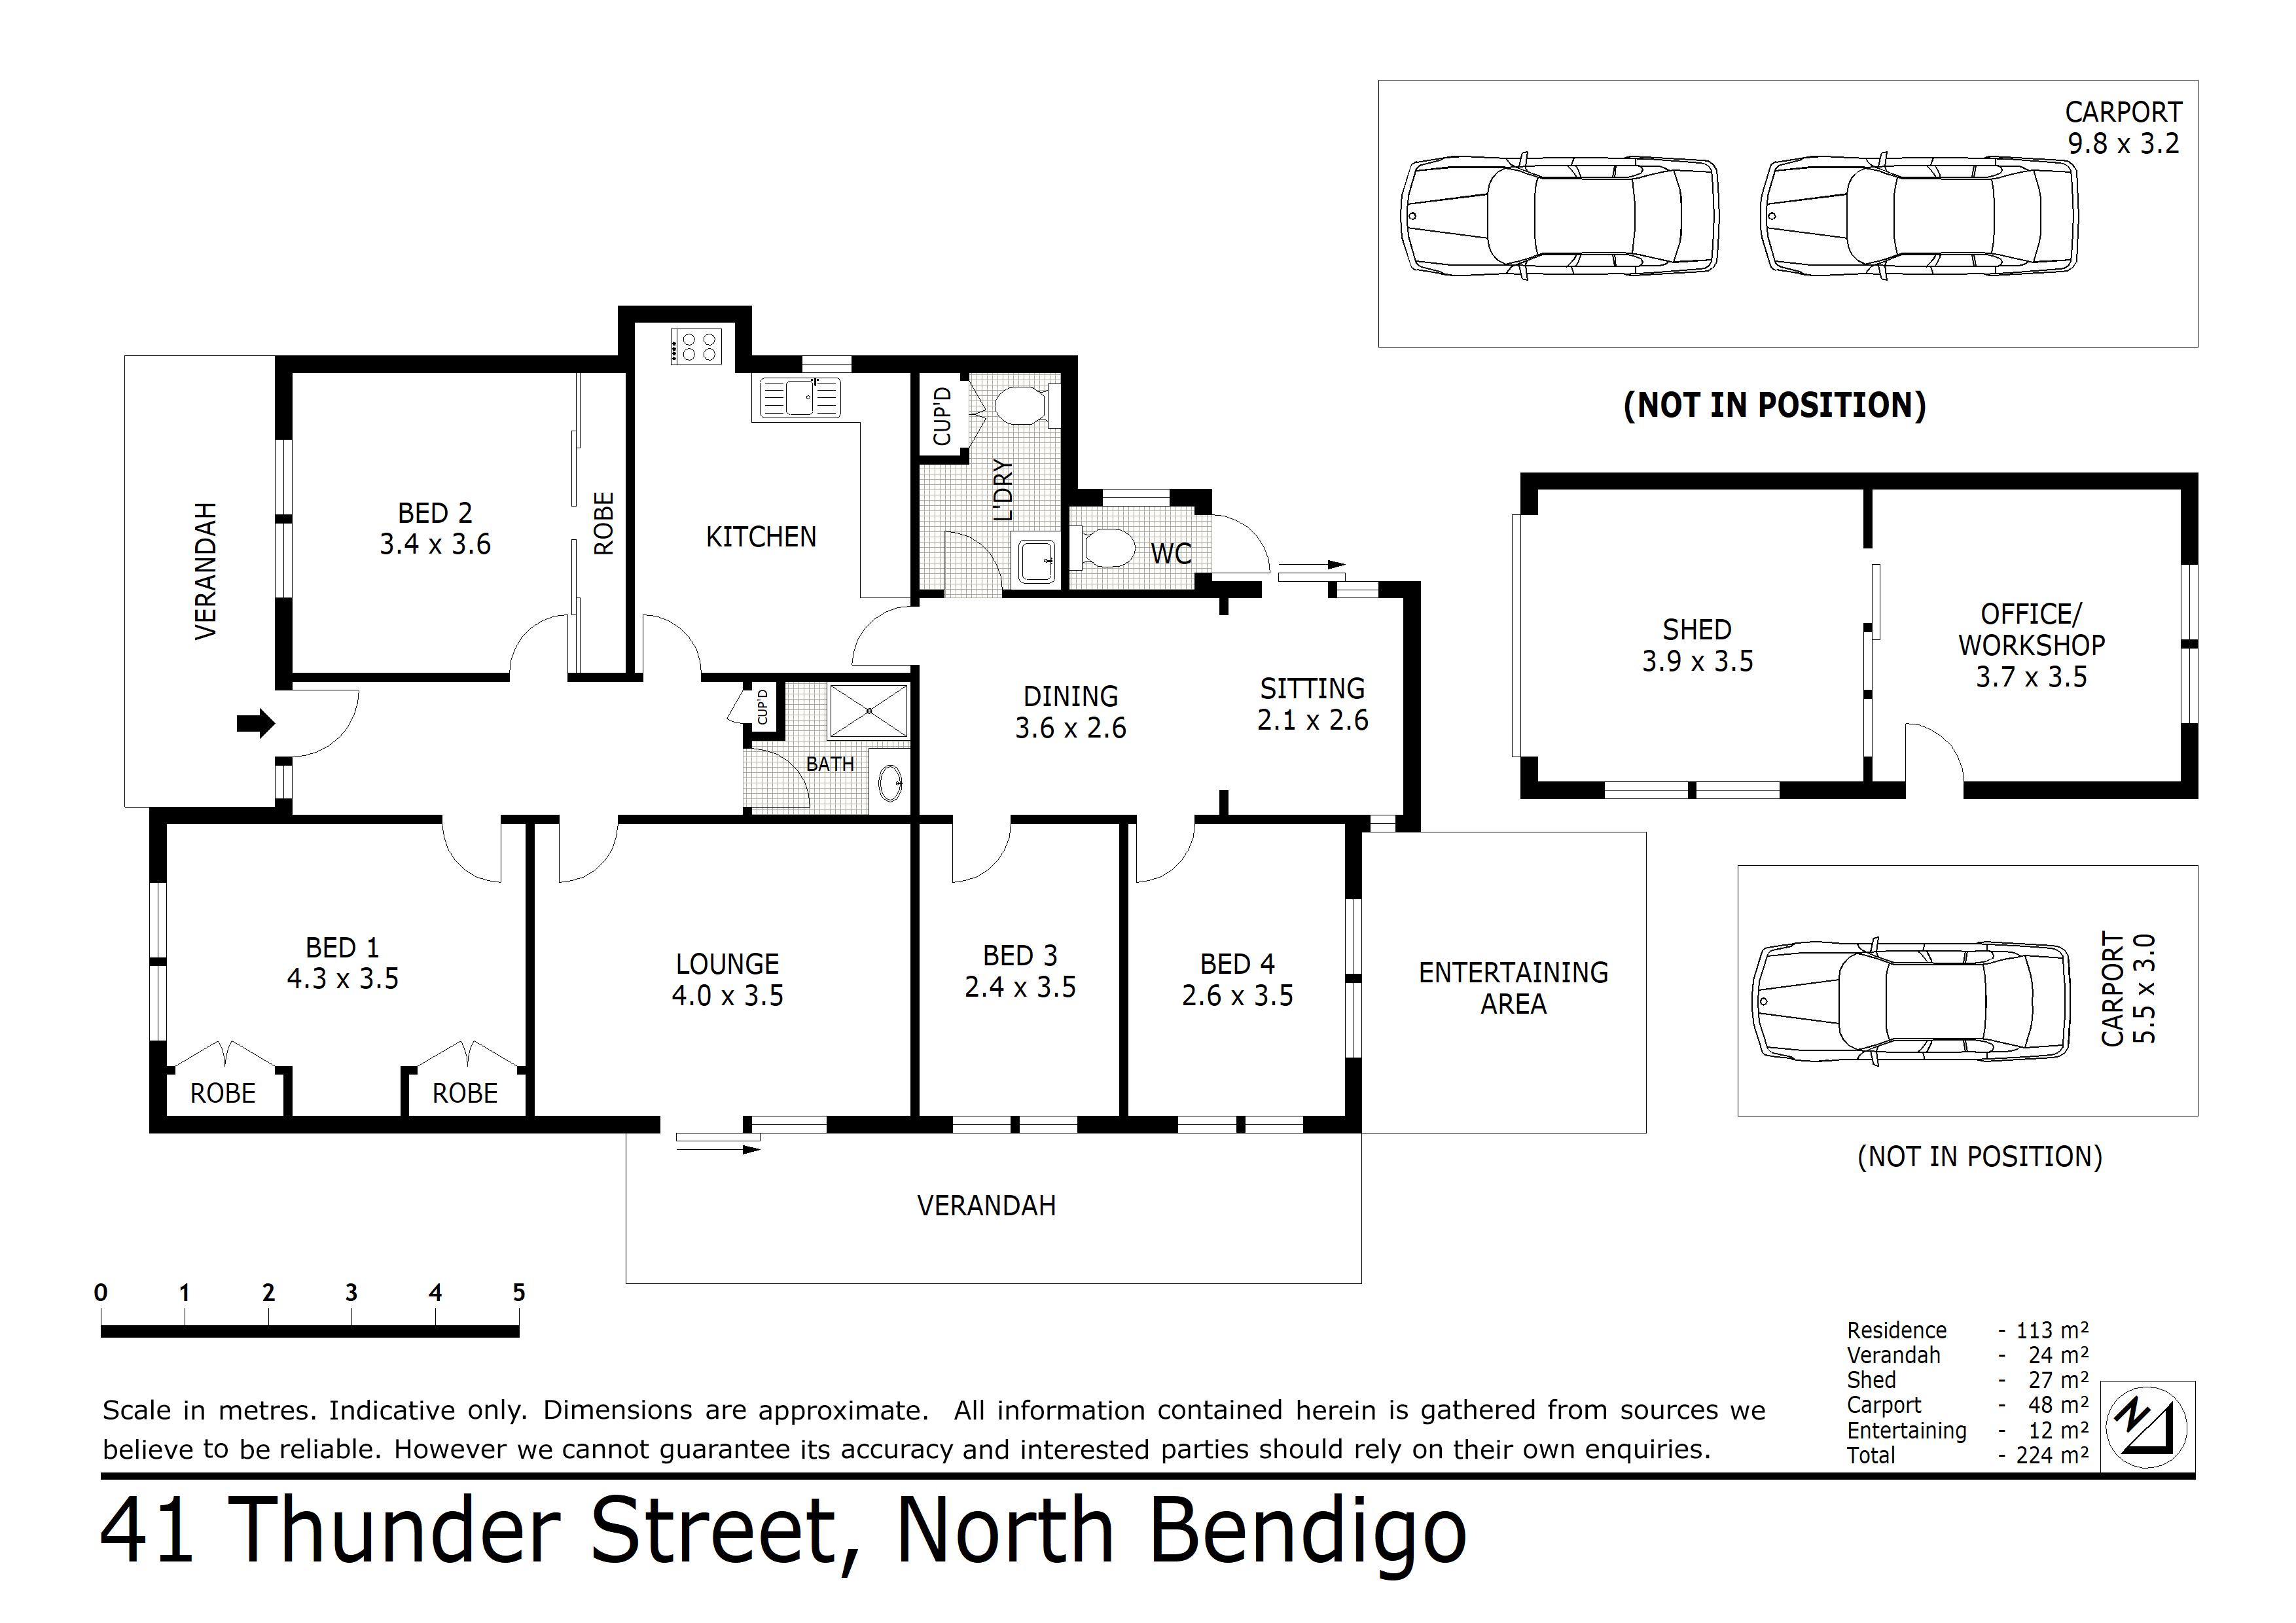 41 Thunder Street, North Bendigo, VIC 3550